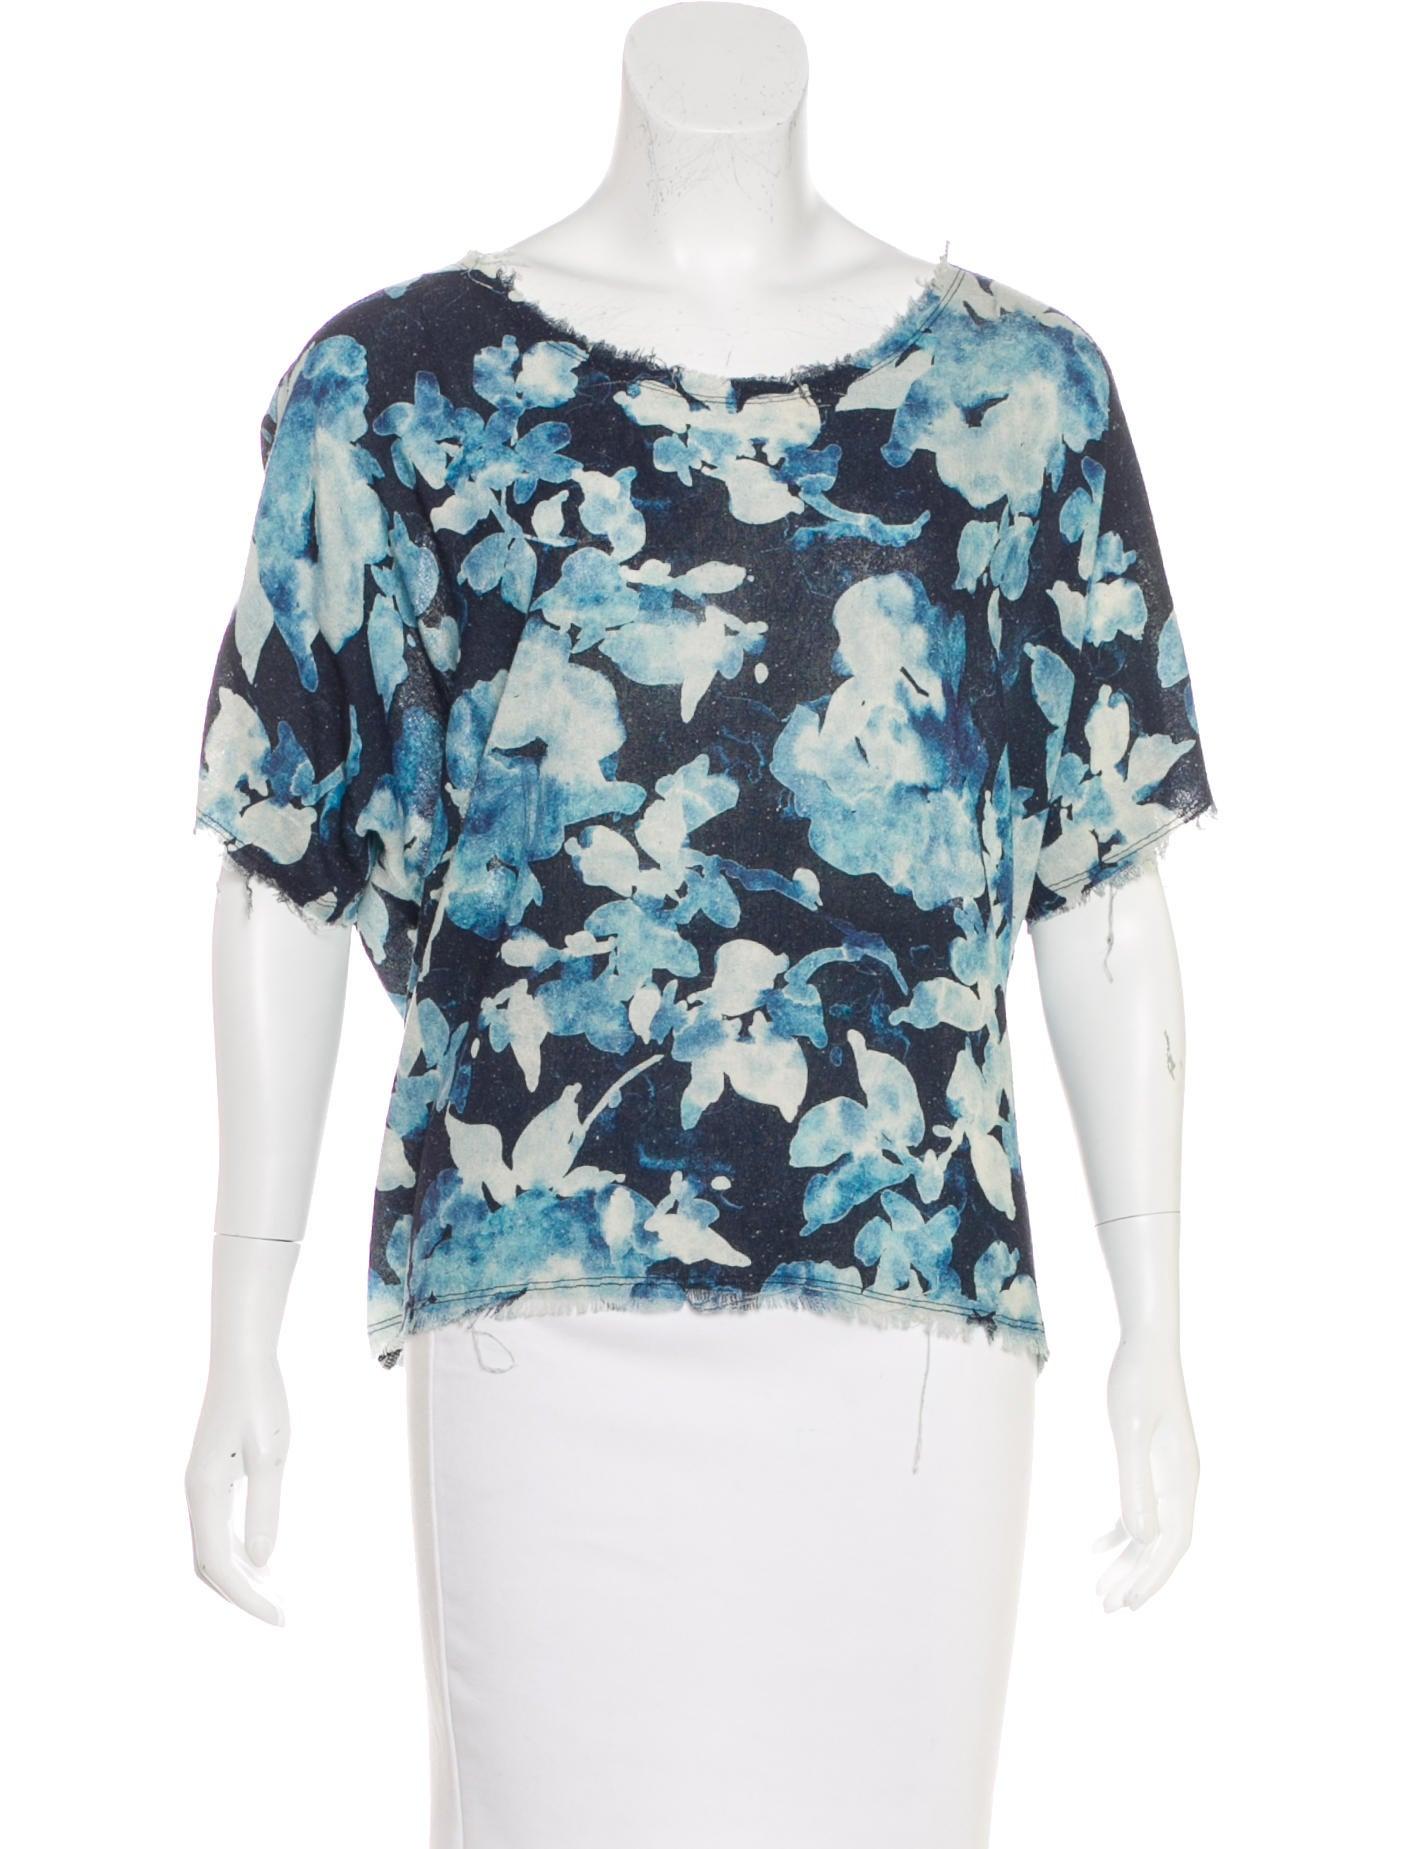 Raquel allegra raw edge silk t shirt clothing for Raw edge t shirt women s